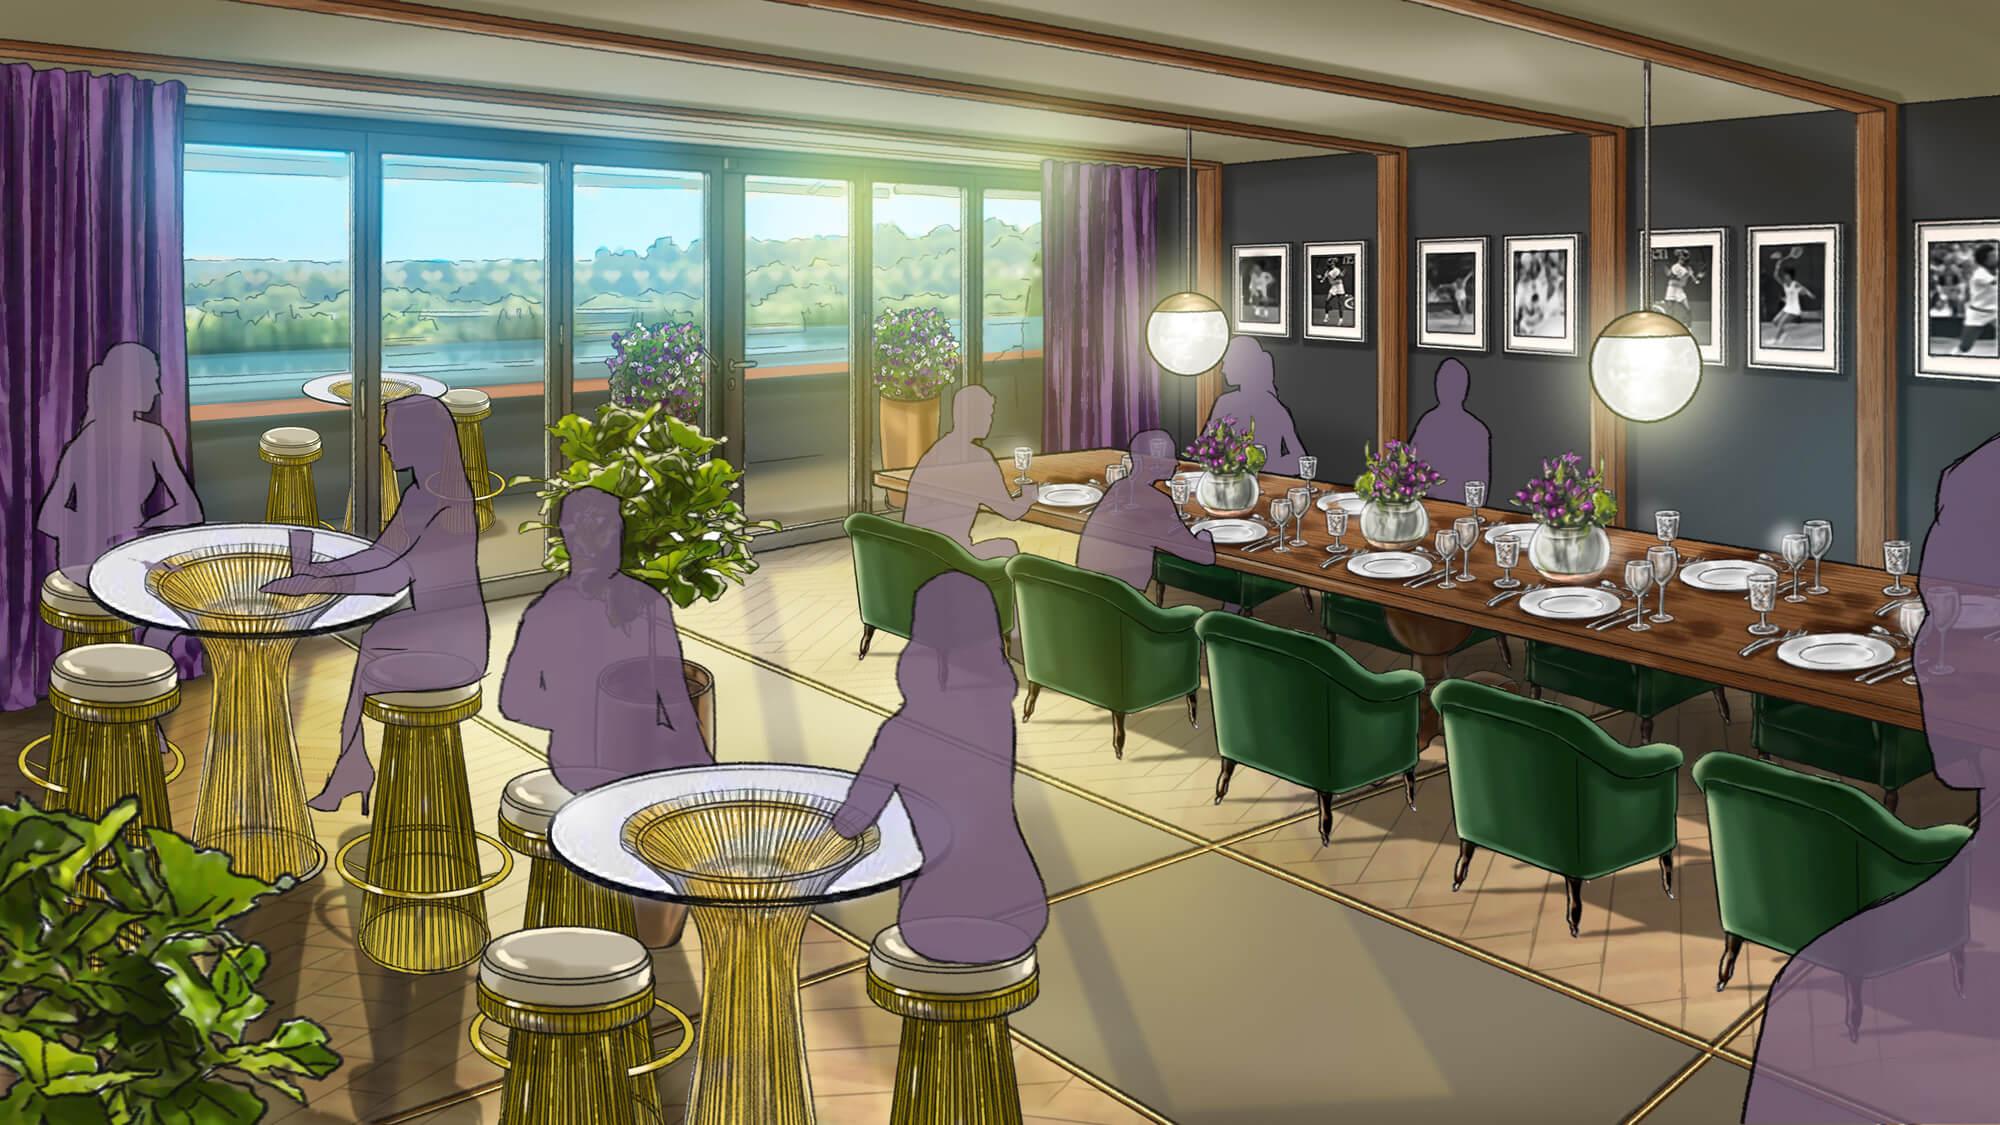 Wimbledon_InteriorDesign1_CentreCourt.jpg